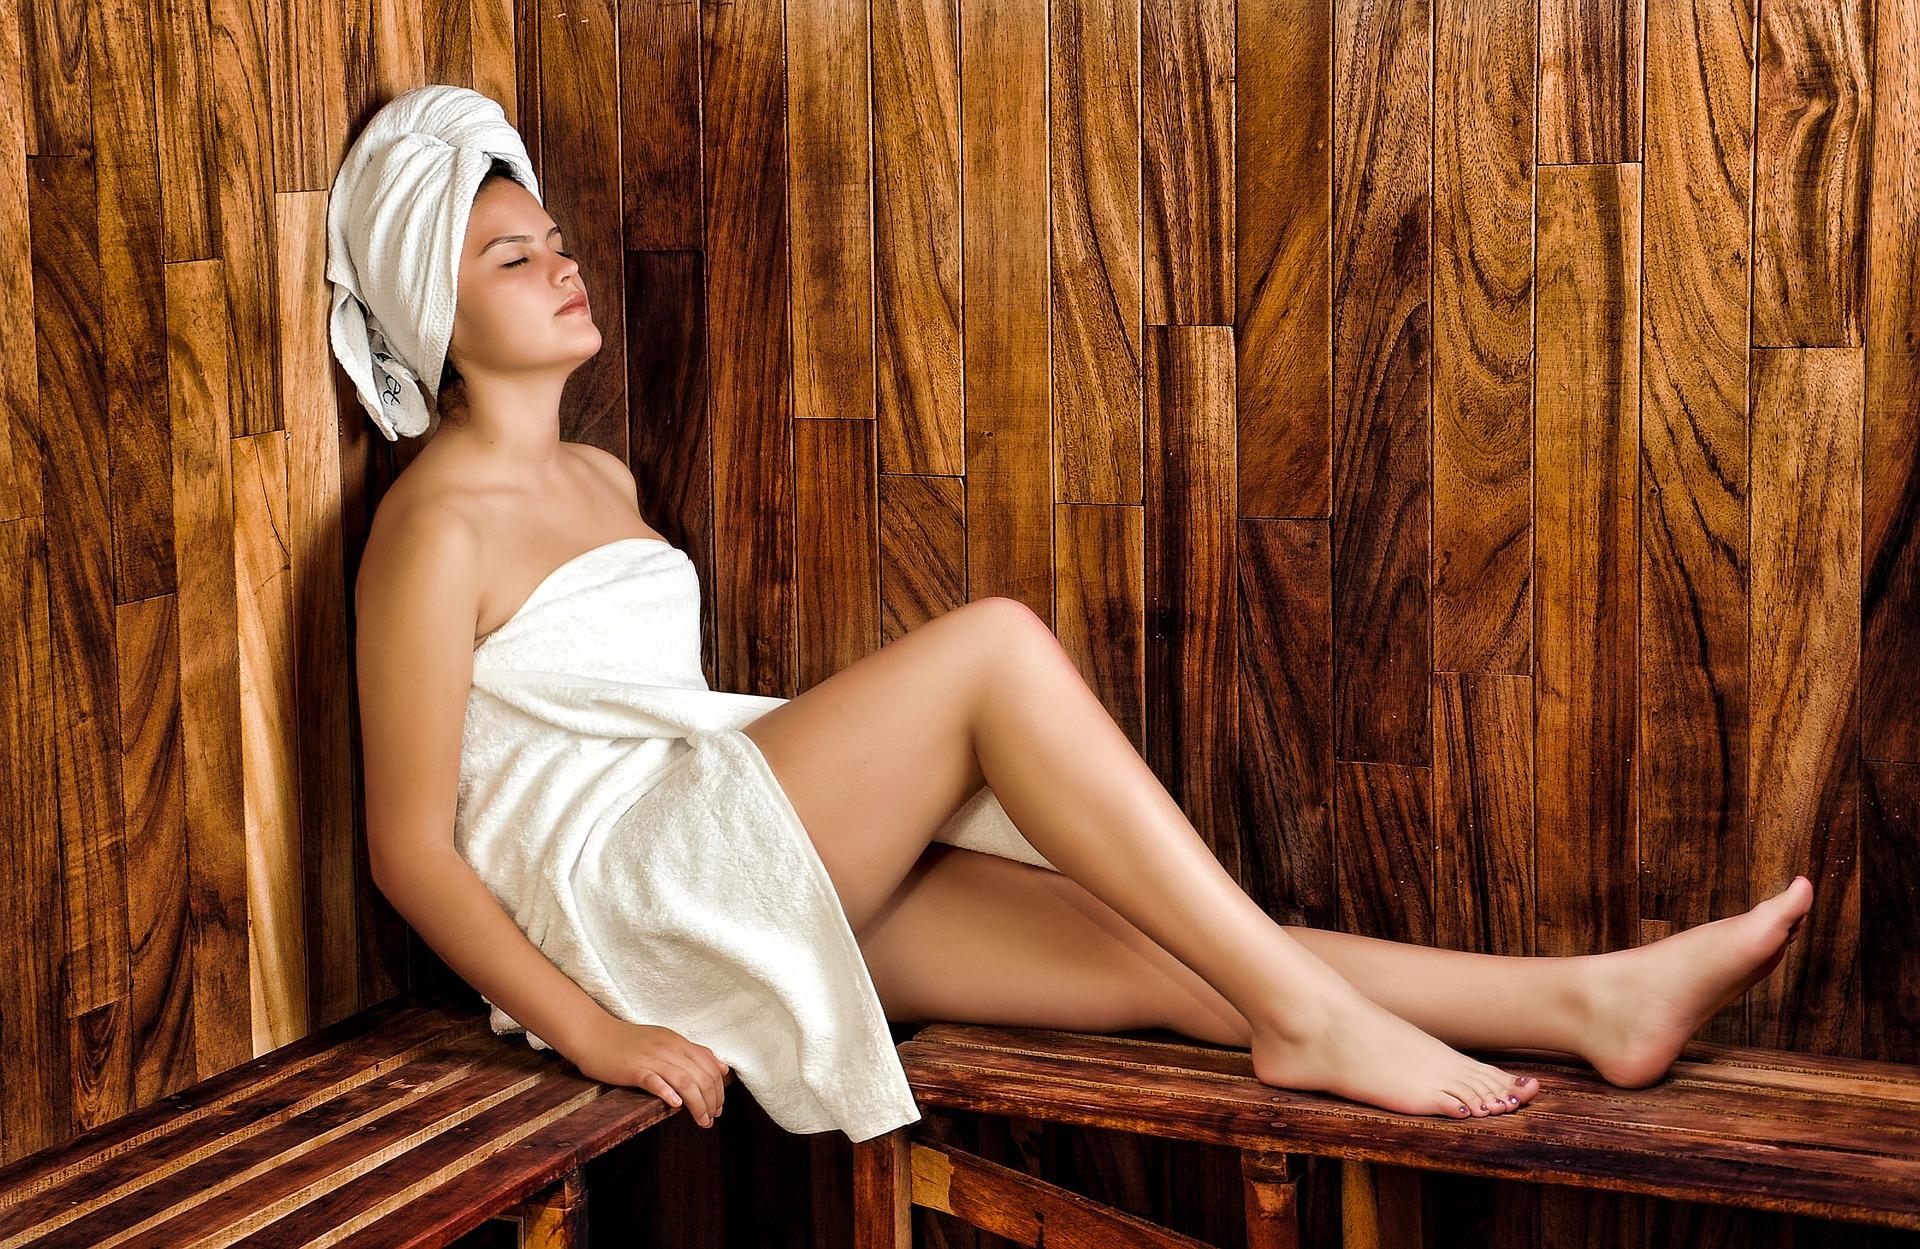 sauna wellness jujuju aquacenter in benissa calpe moraira javea denia altea benidorm costa blanca alicante